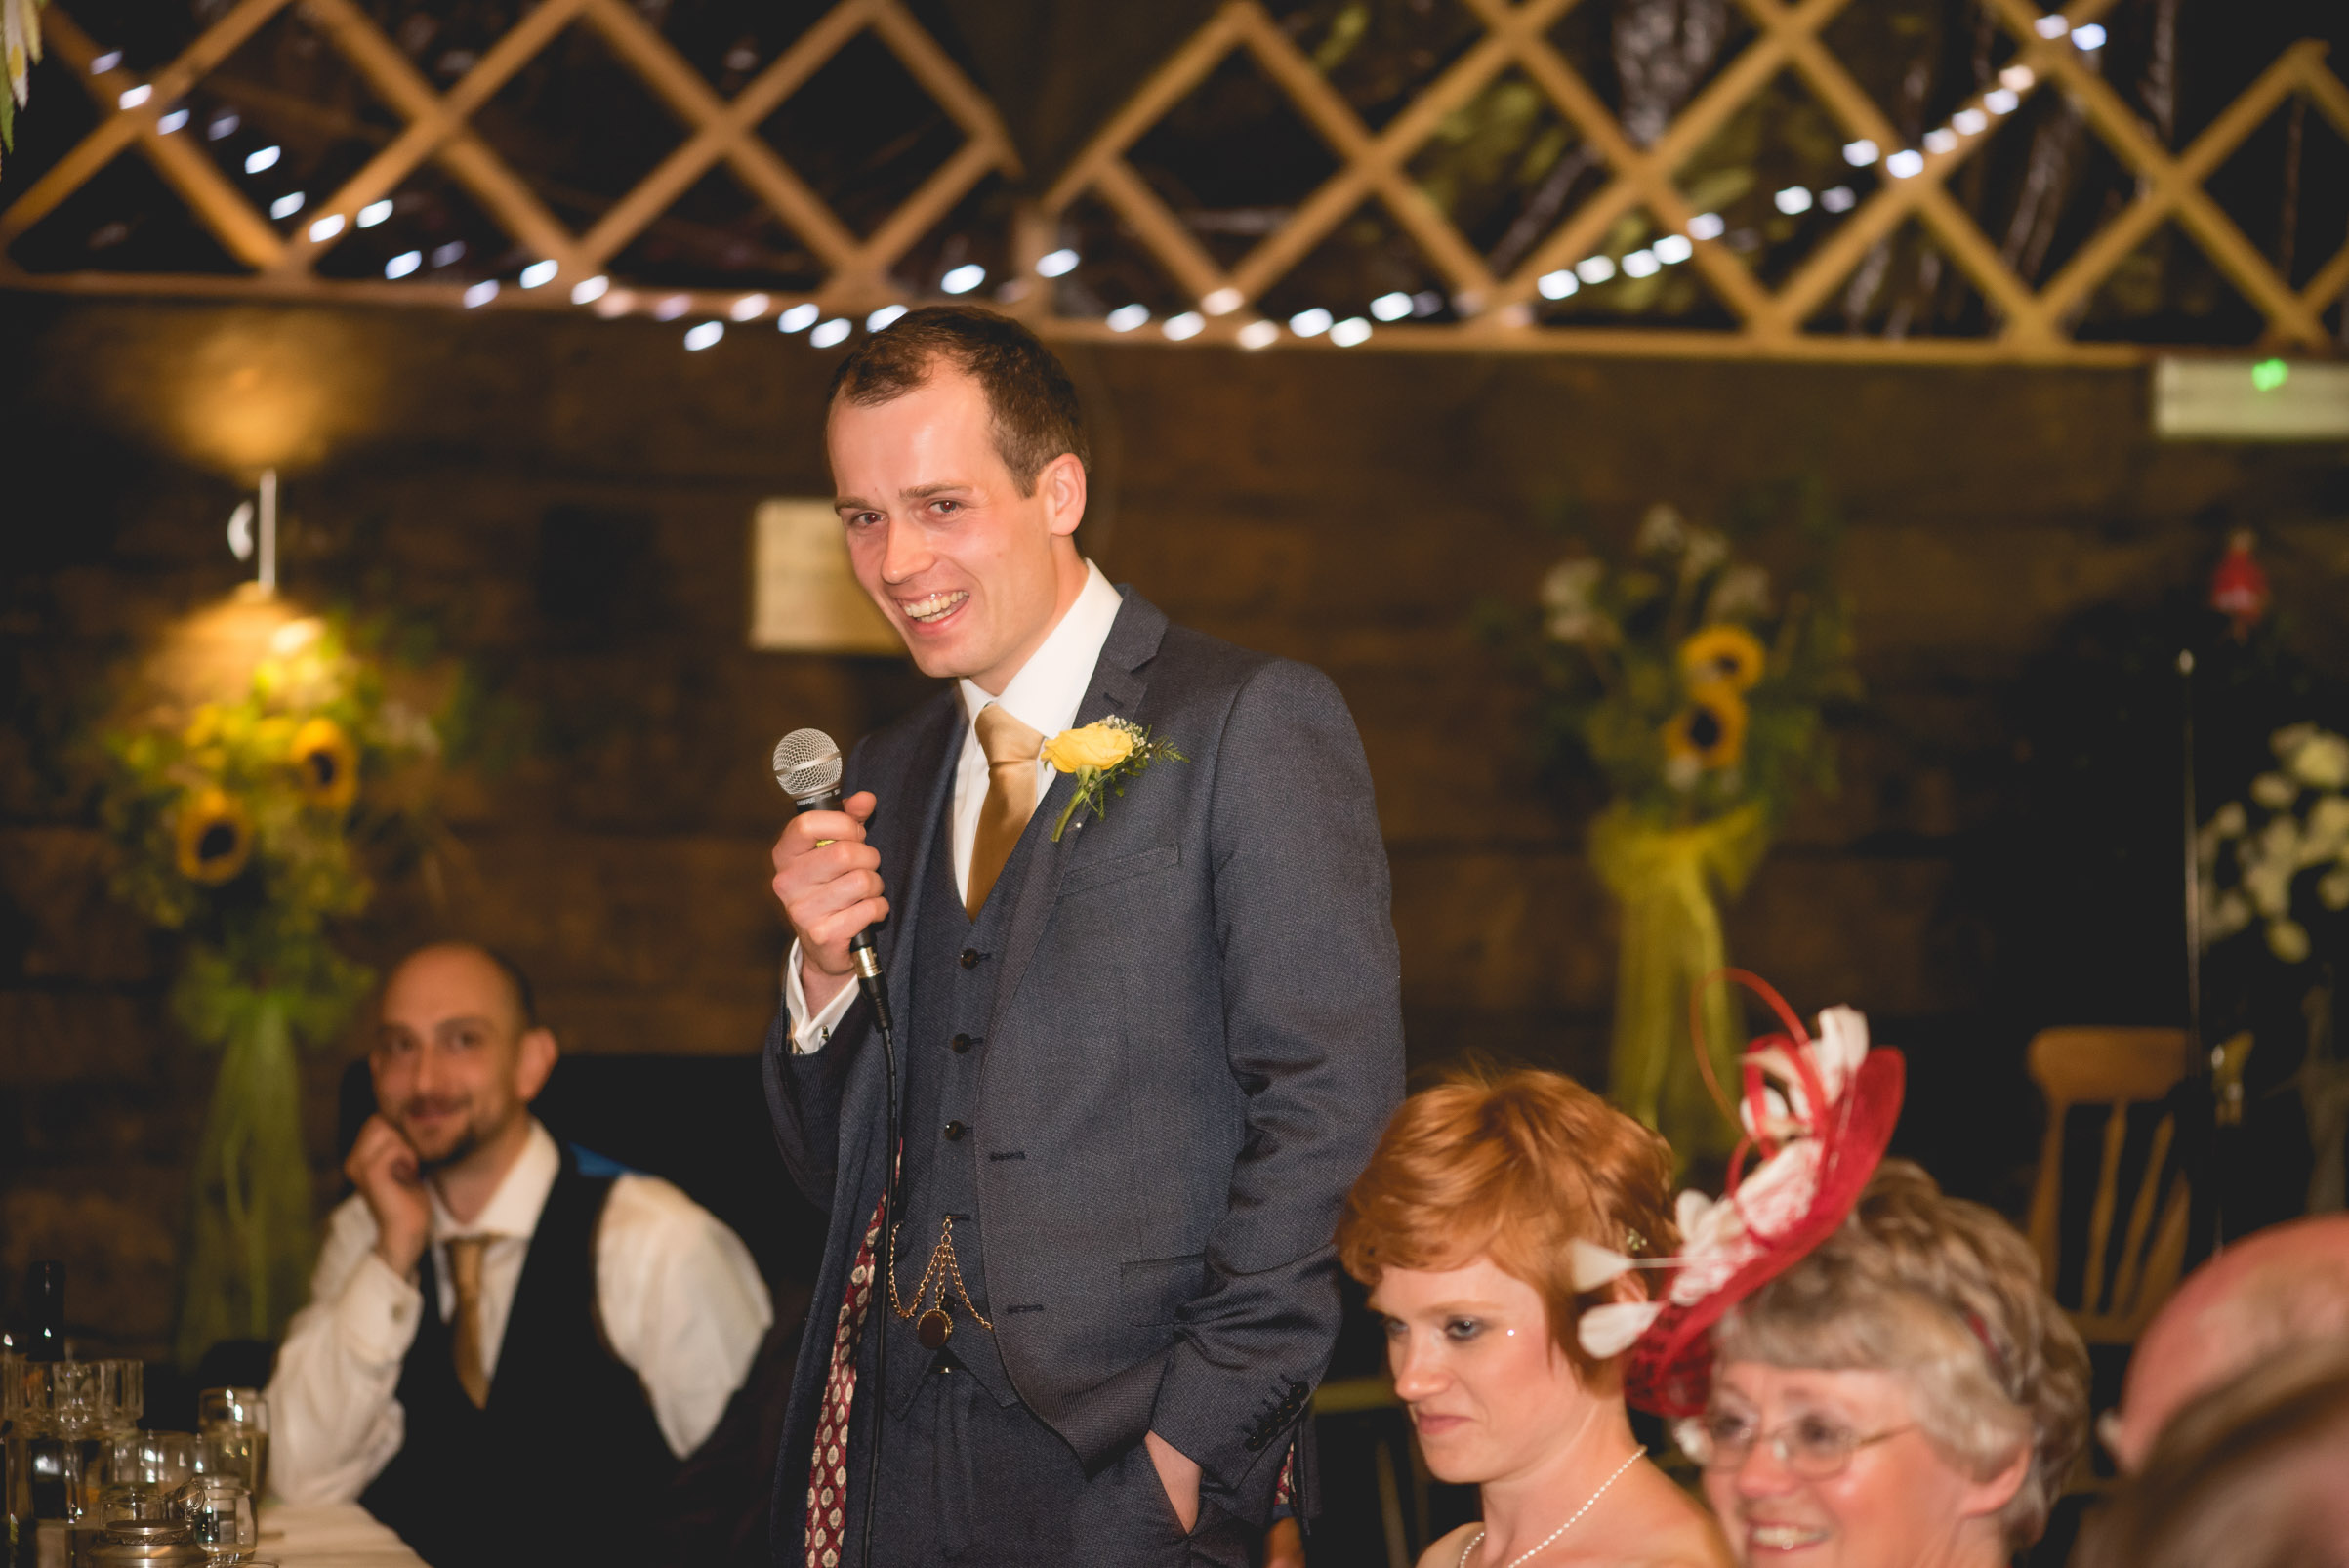 Peak+district+farm+wedding+lower+damgate+photographer-221.jpg